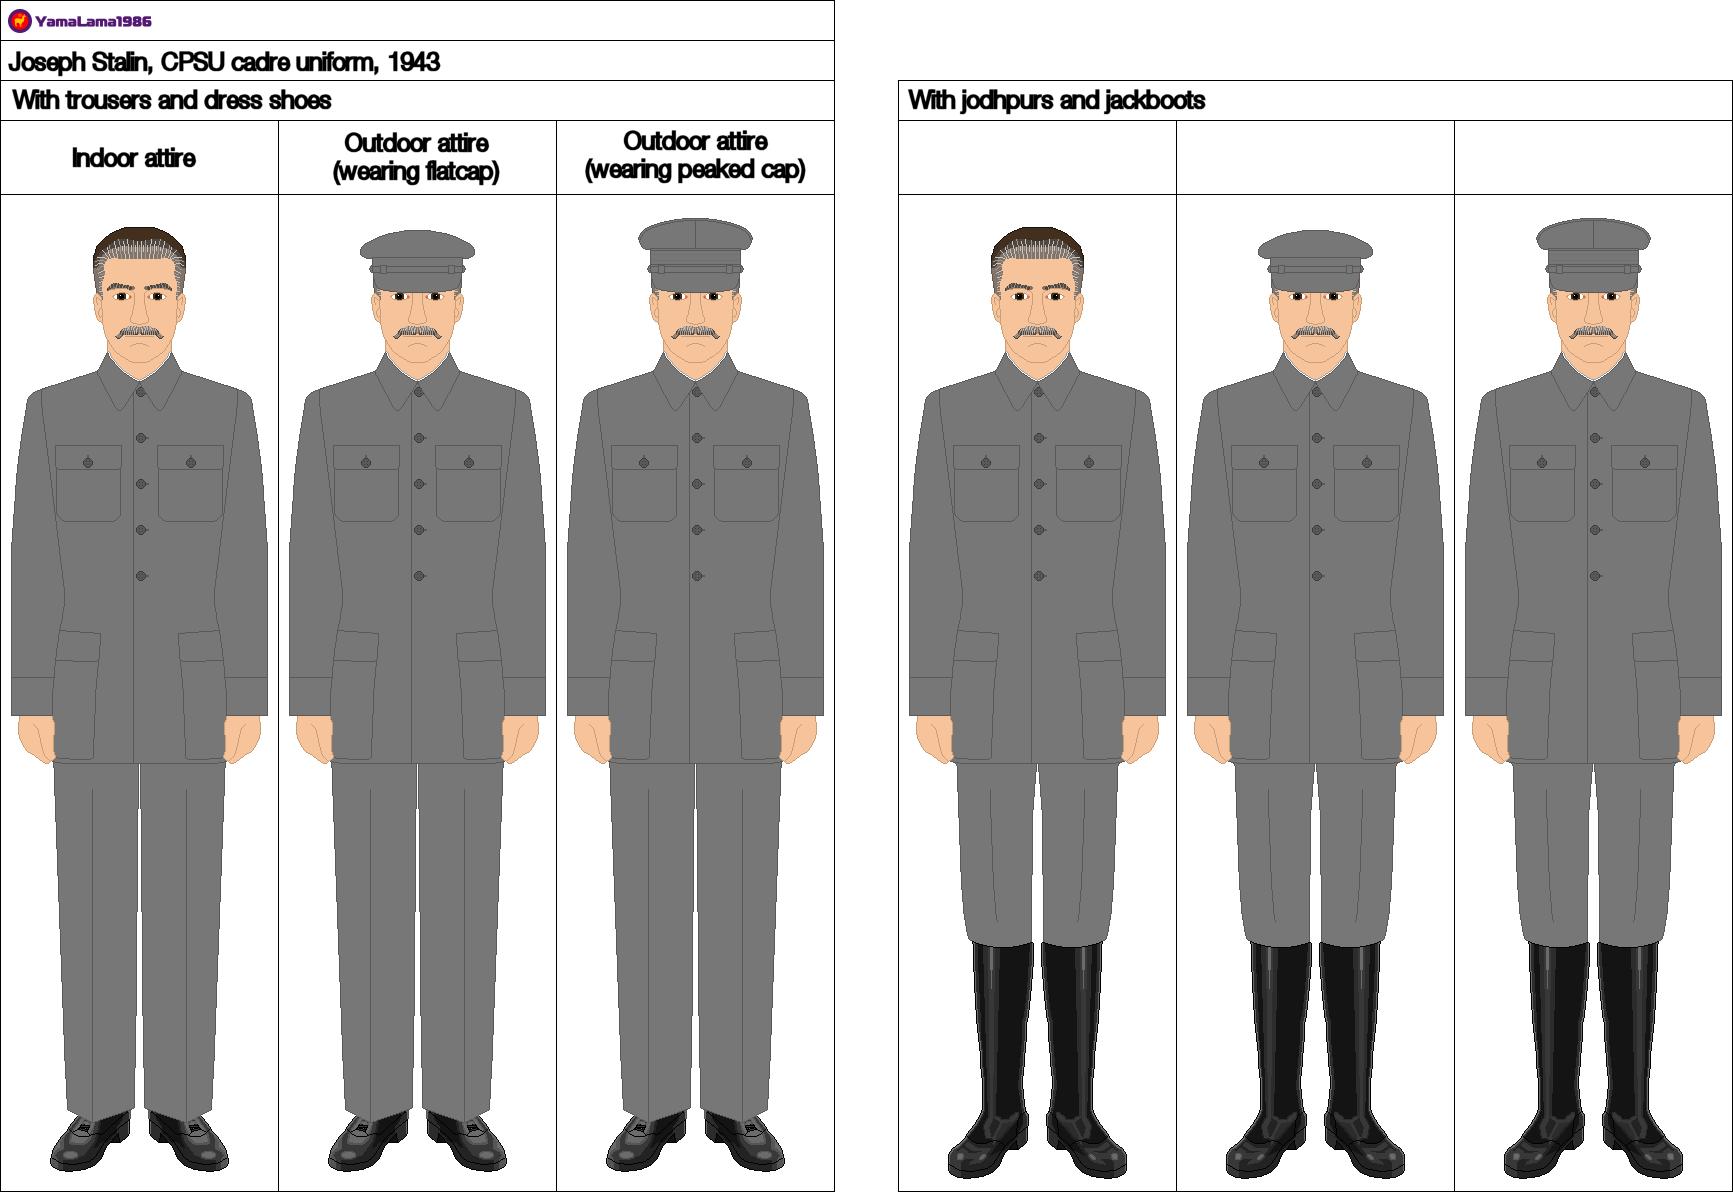 joseph stalin cpsu cadre uniform 1943 by yamalama1986 on deviantart. Black Bedroom Furniture Sets. Home Design Ideas